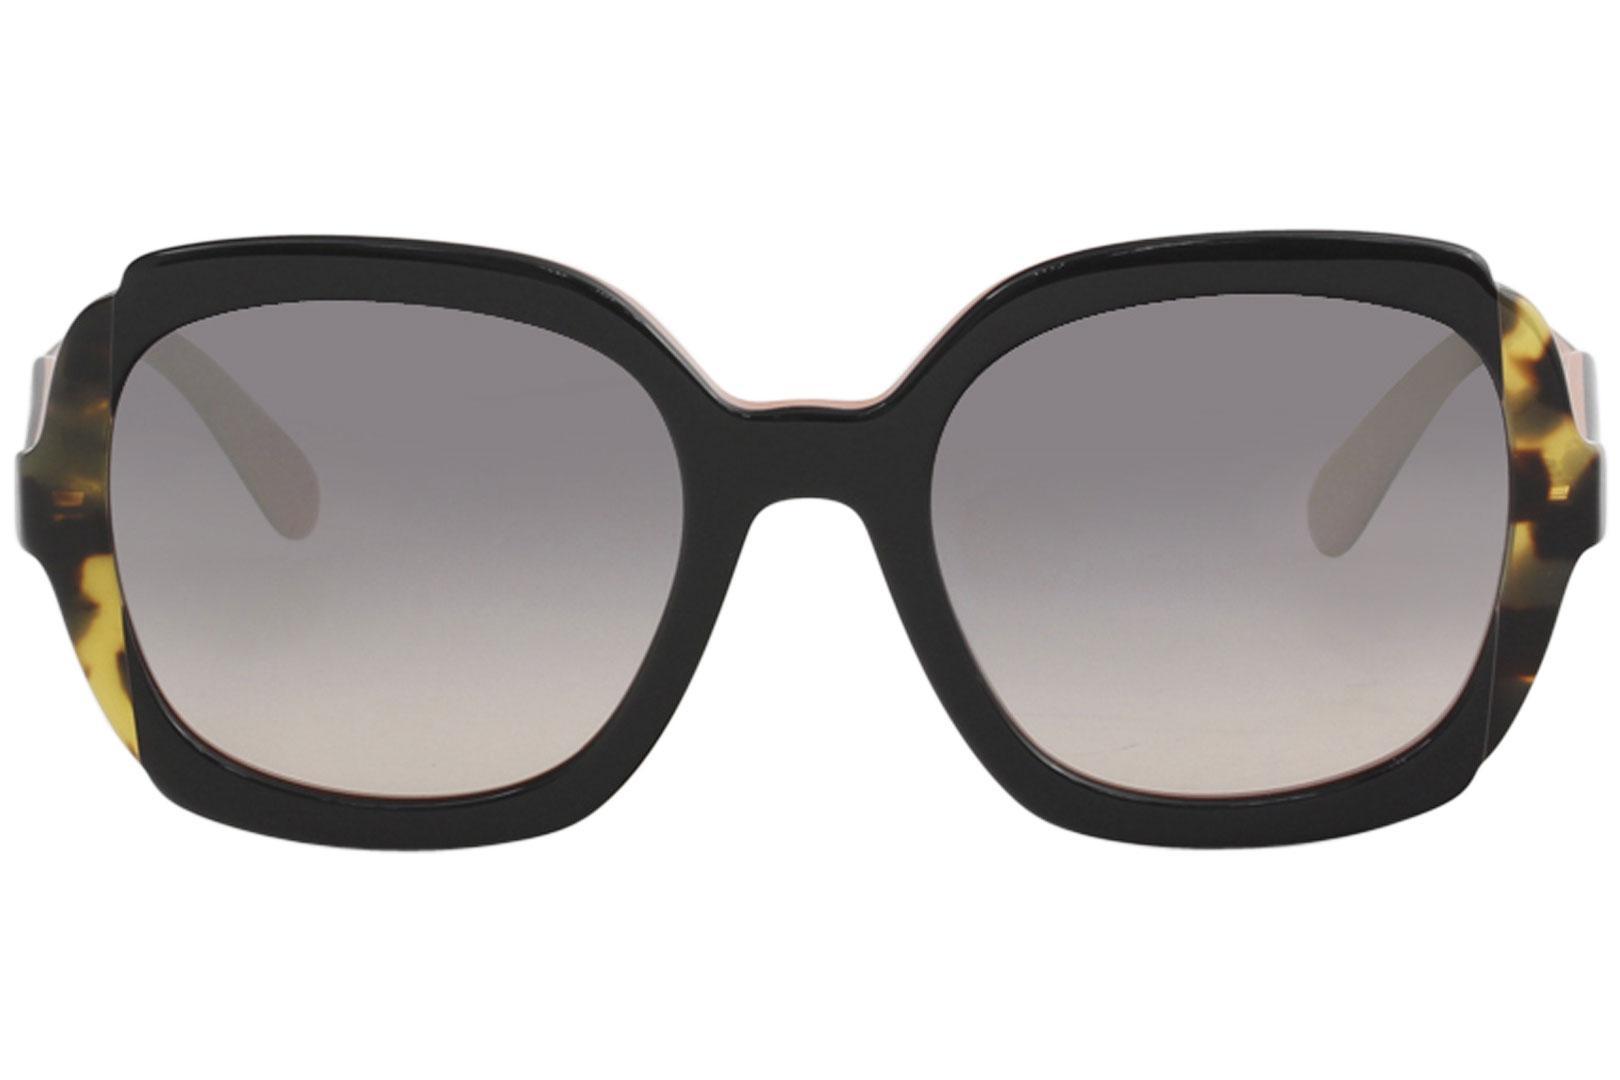 0dd68fb99379d Prada Women s SPR16U SPR 16U Fashion Square Sunglasses by Prada